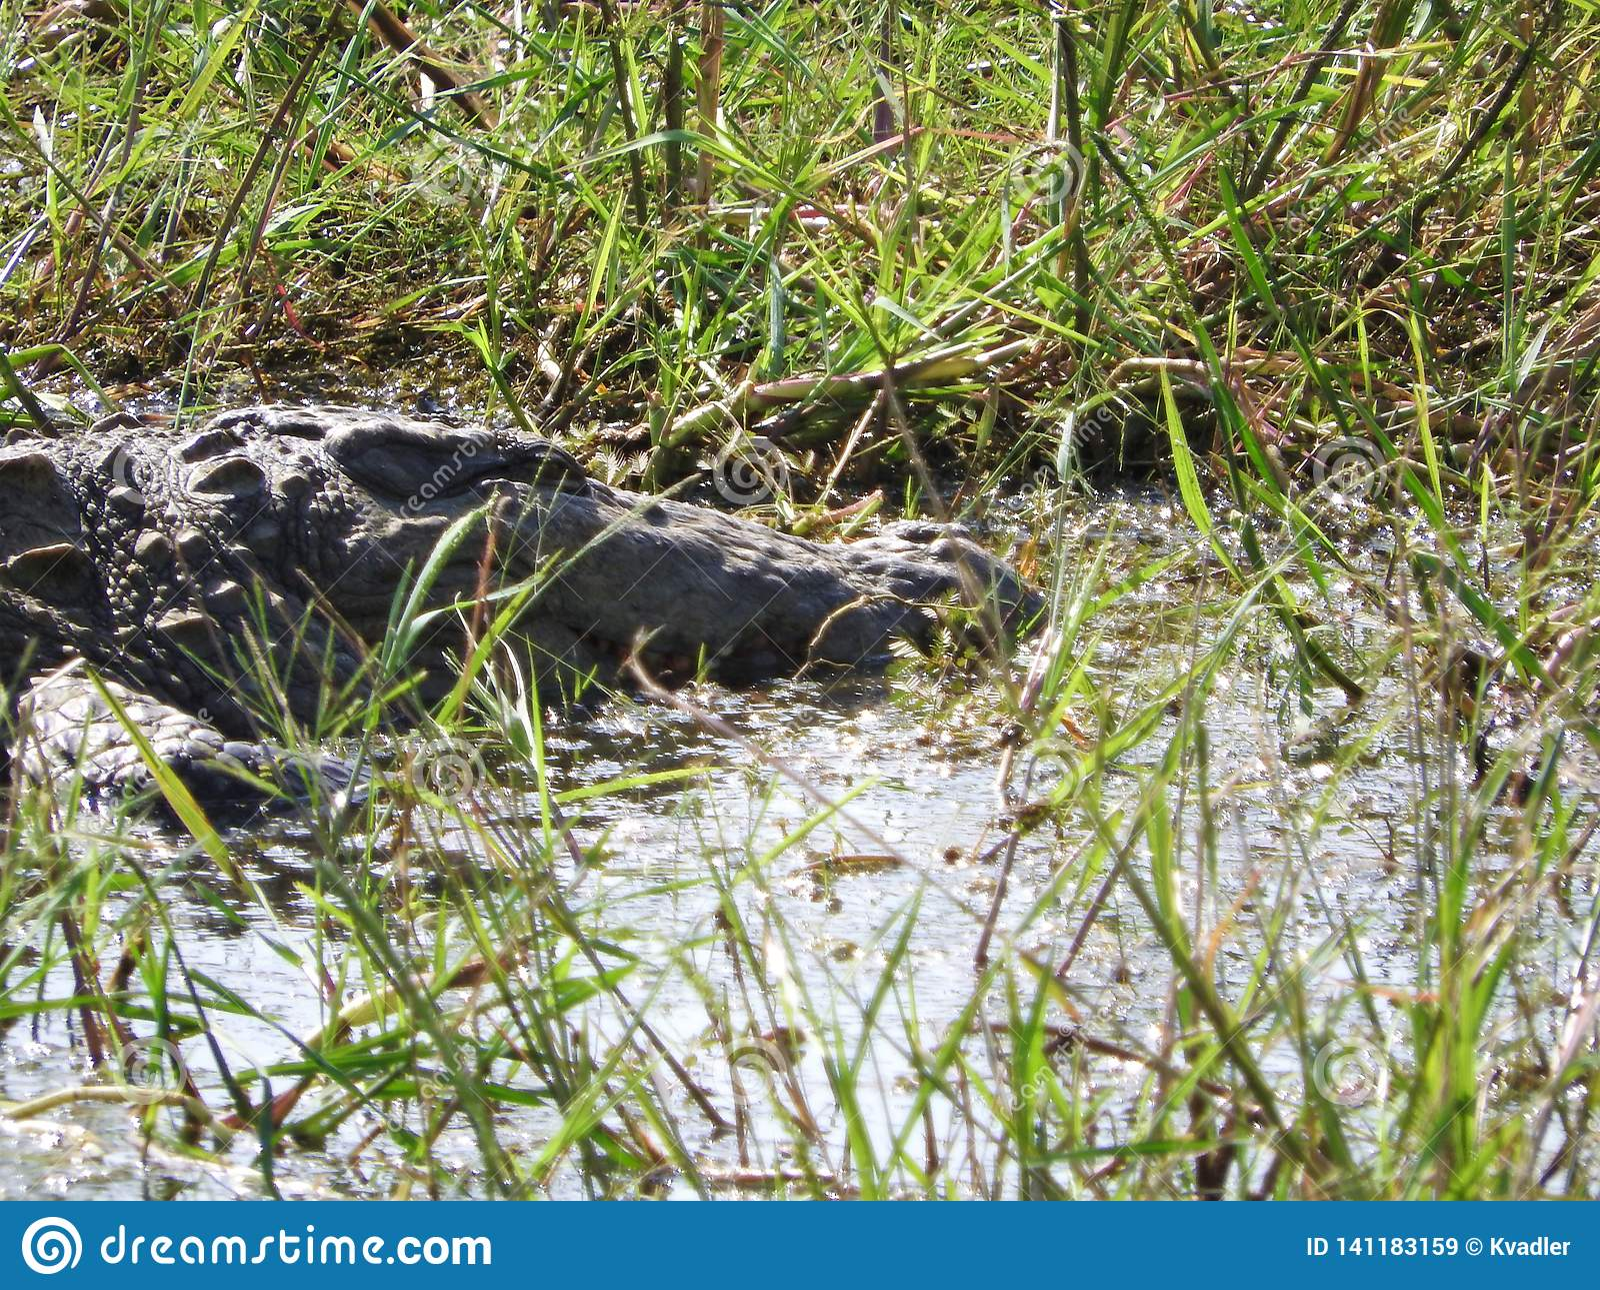 Аллигатор в национальном парке Yala на острове Шри-Ланка